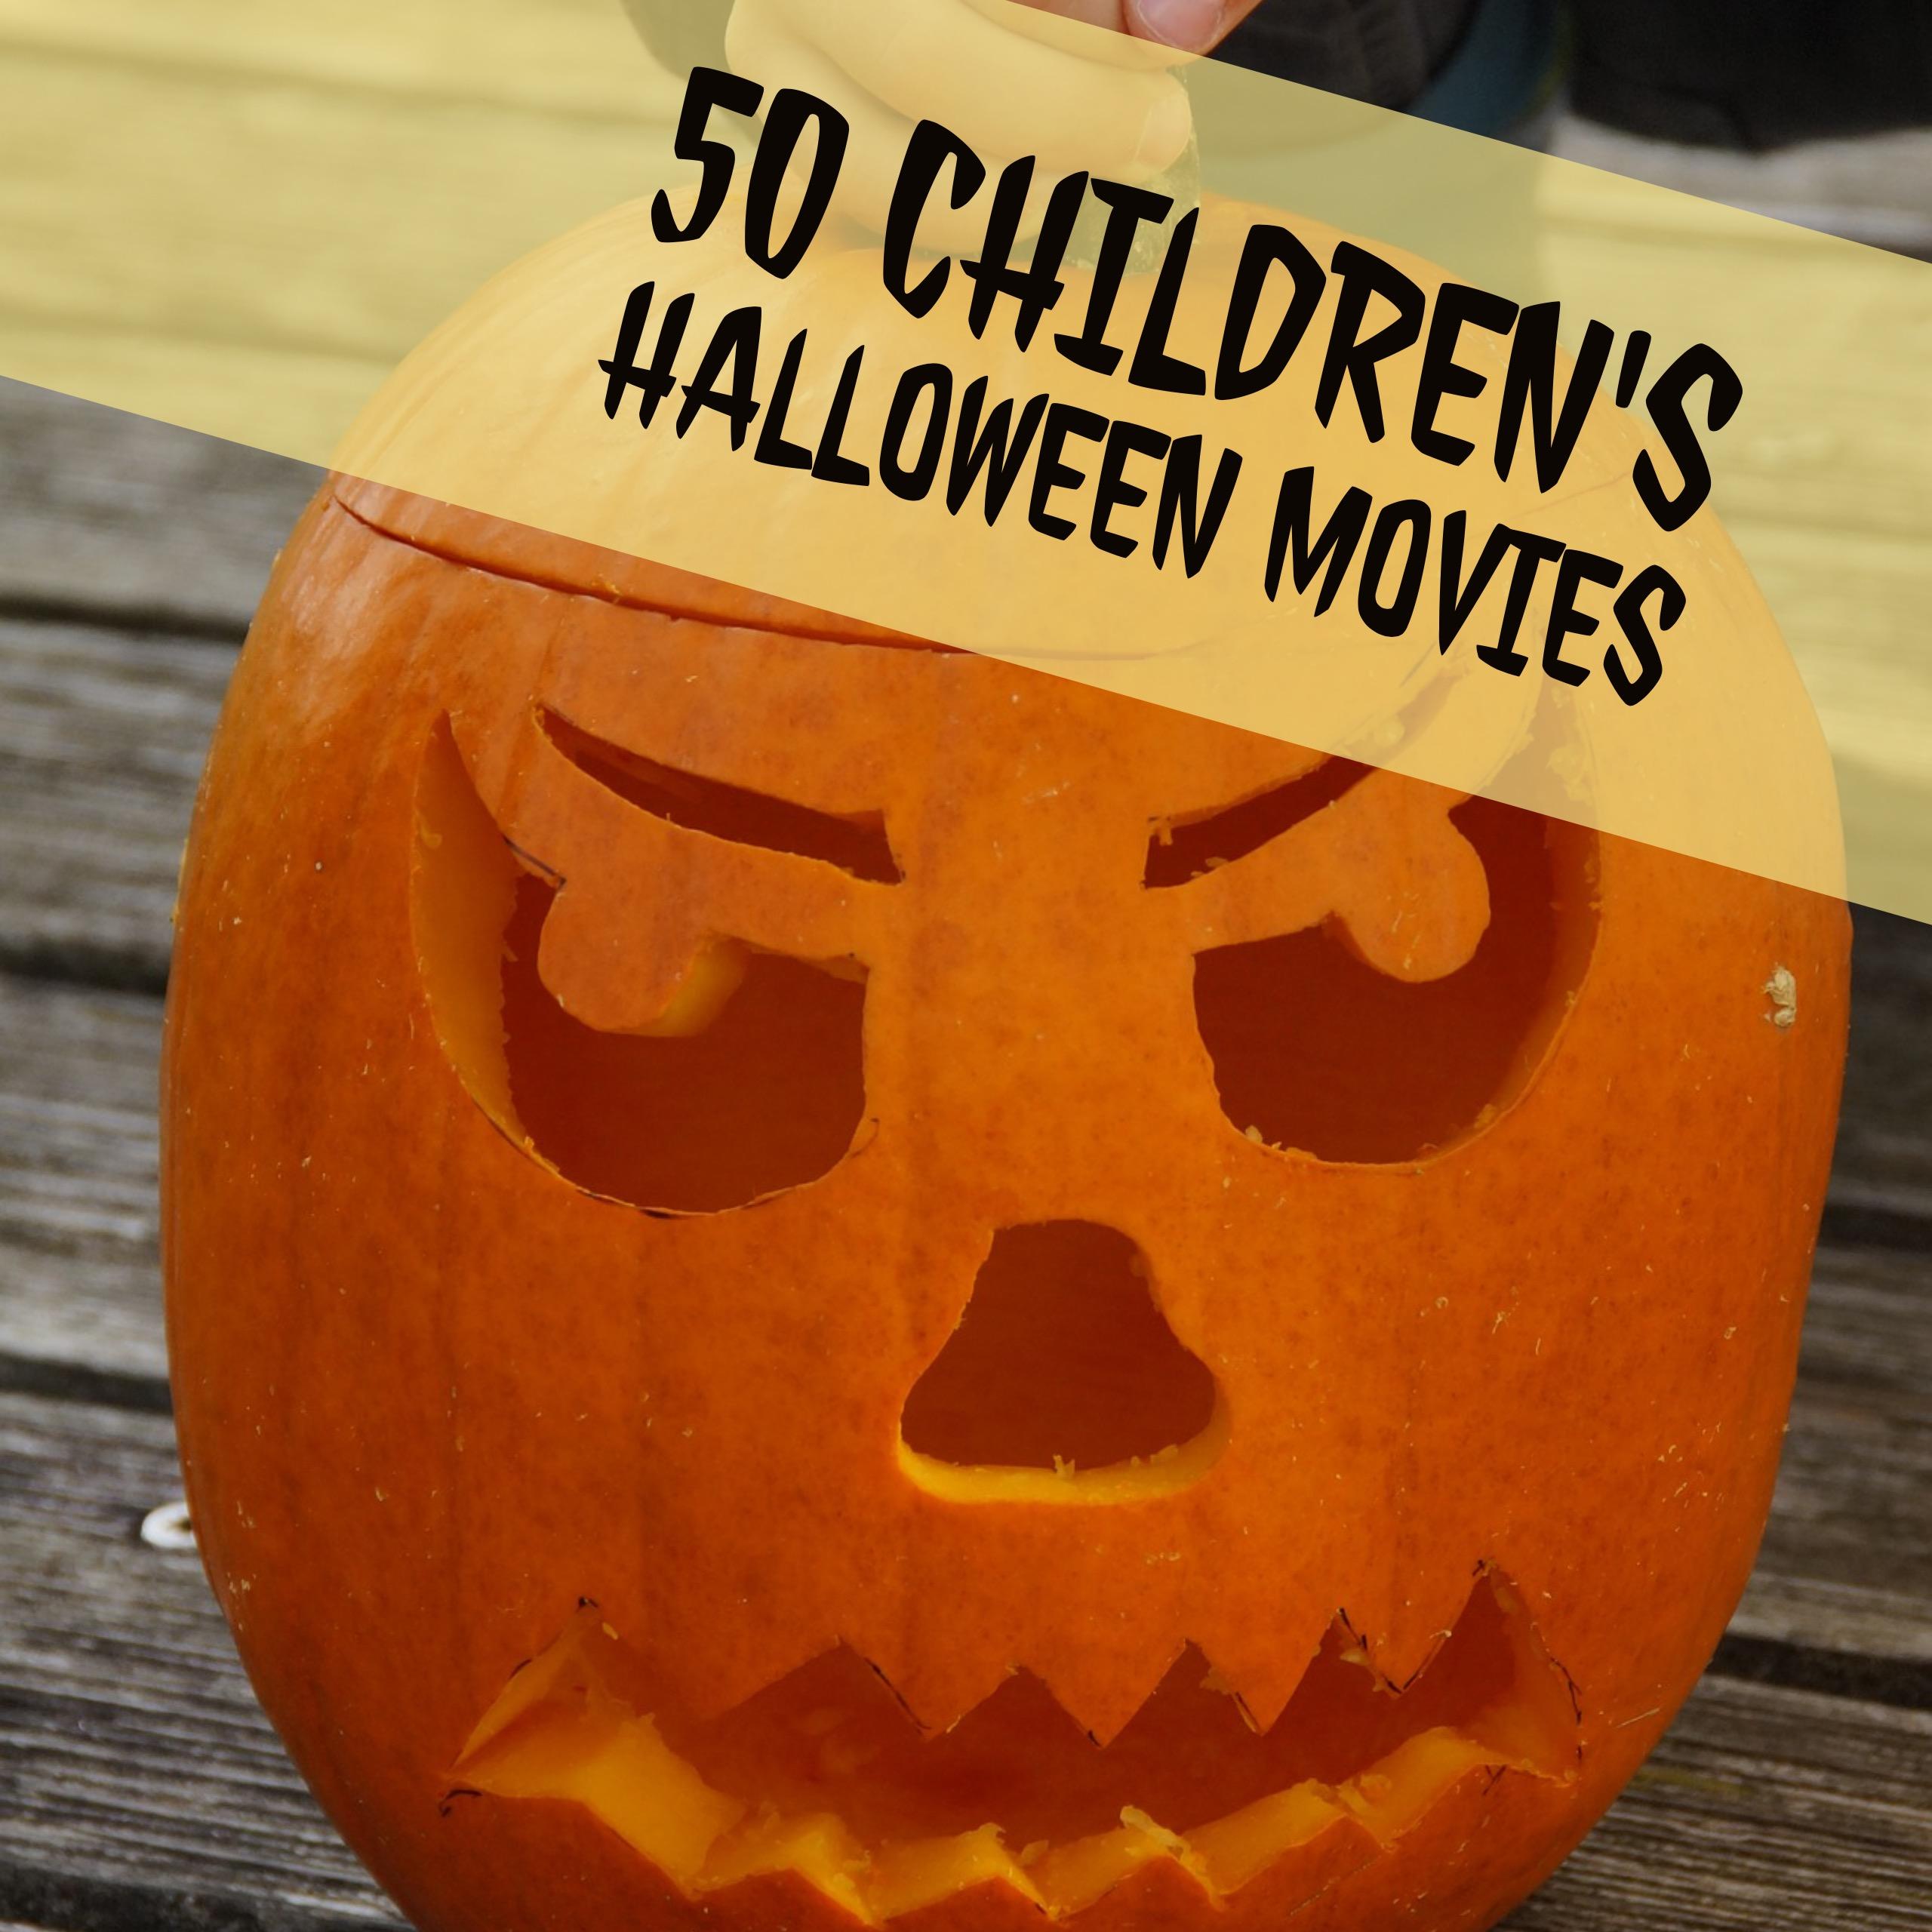 childrens_Halloween_movies